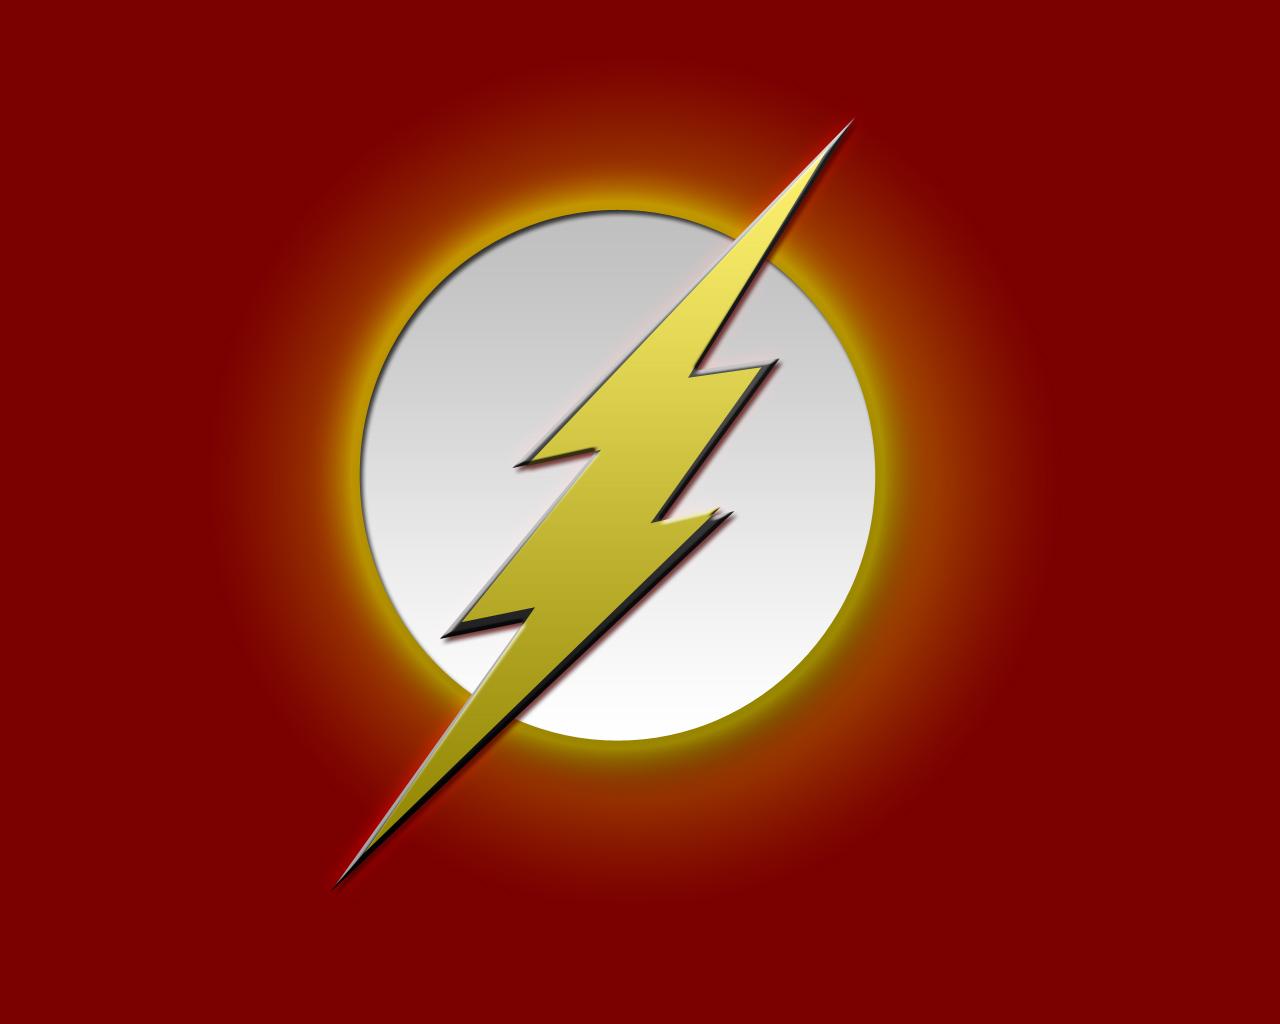 Flash Superhero Logos